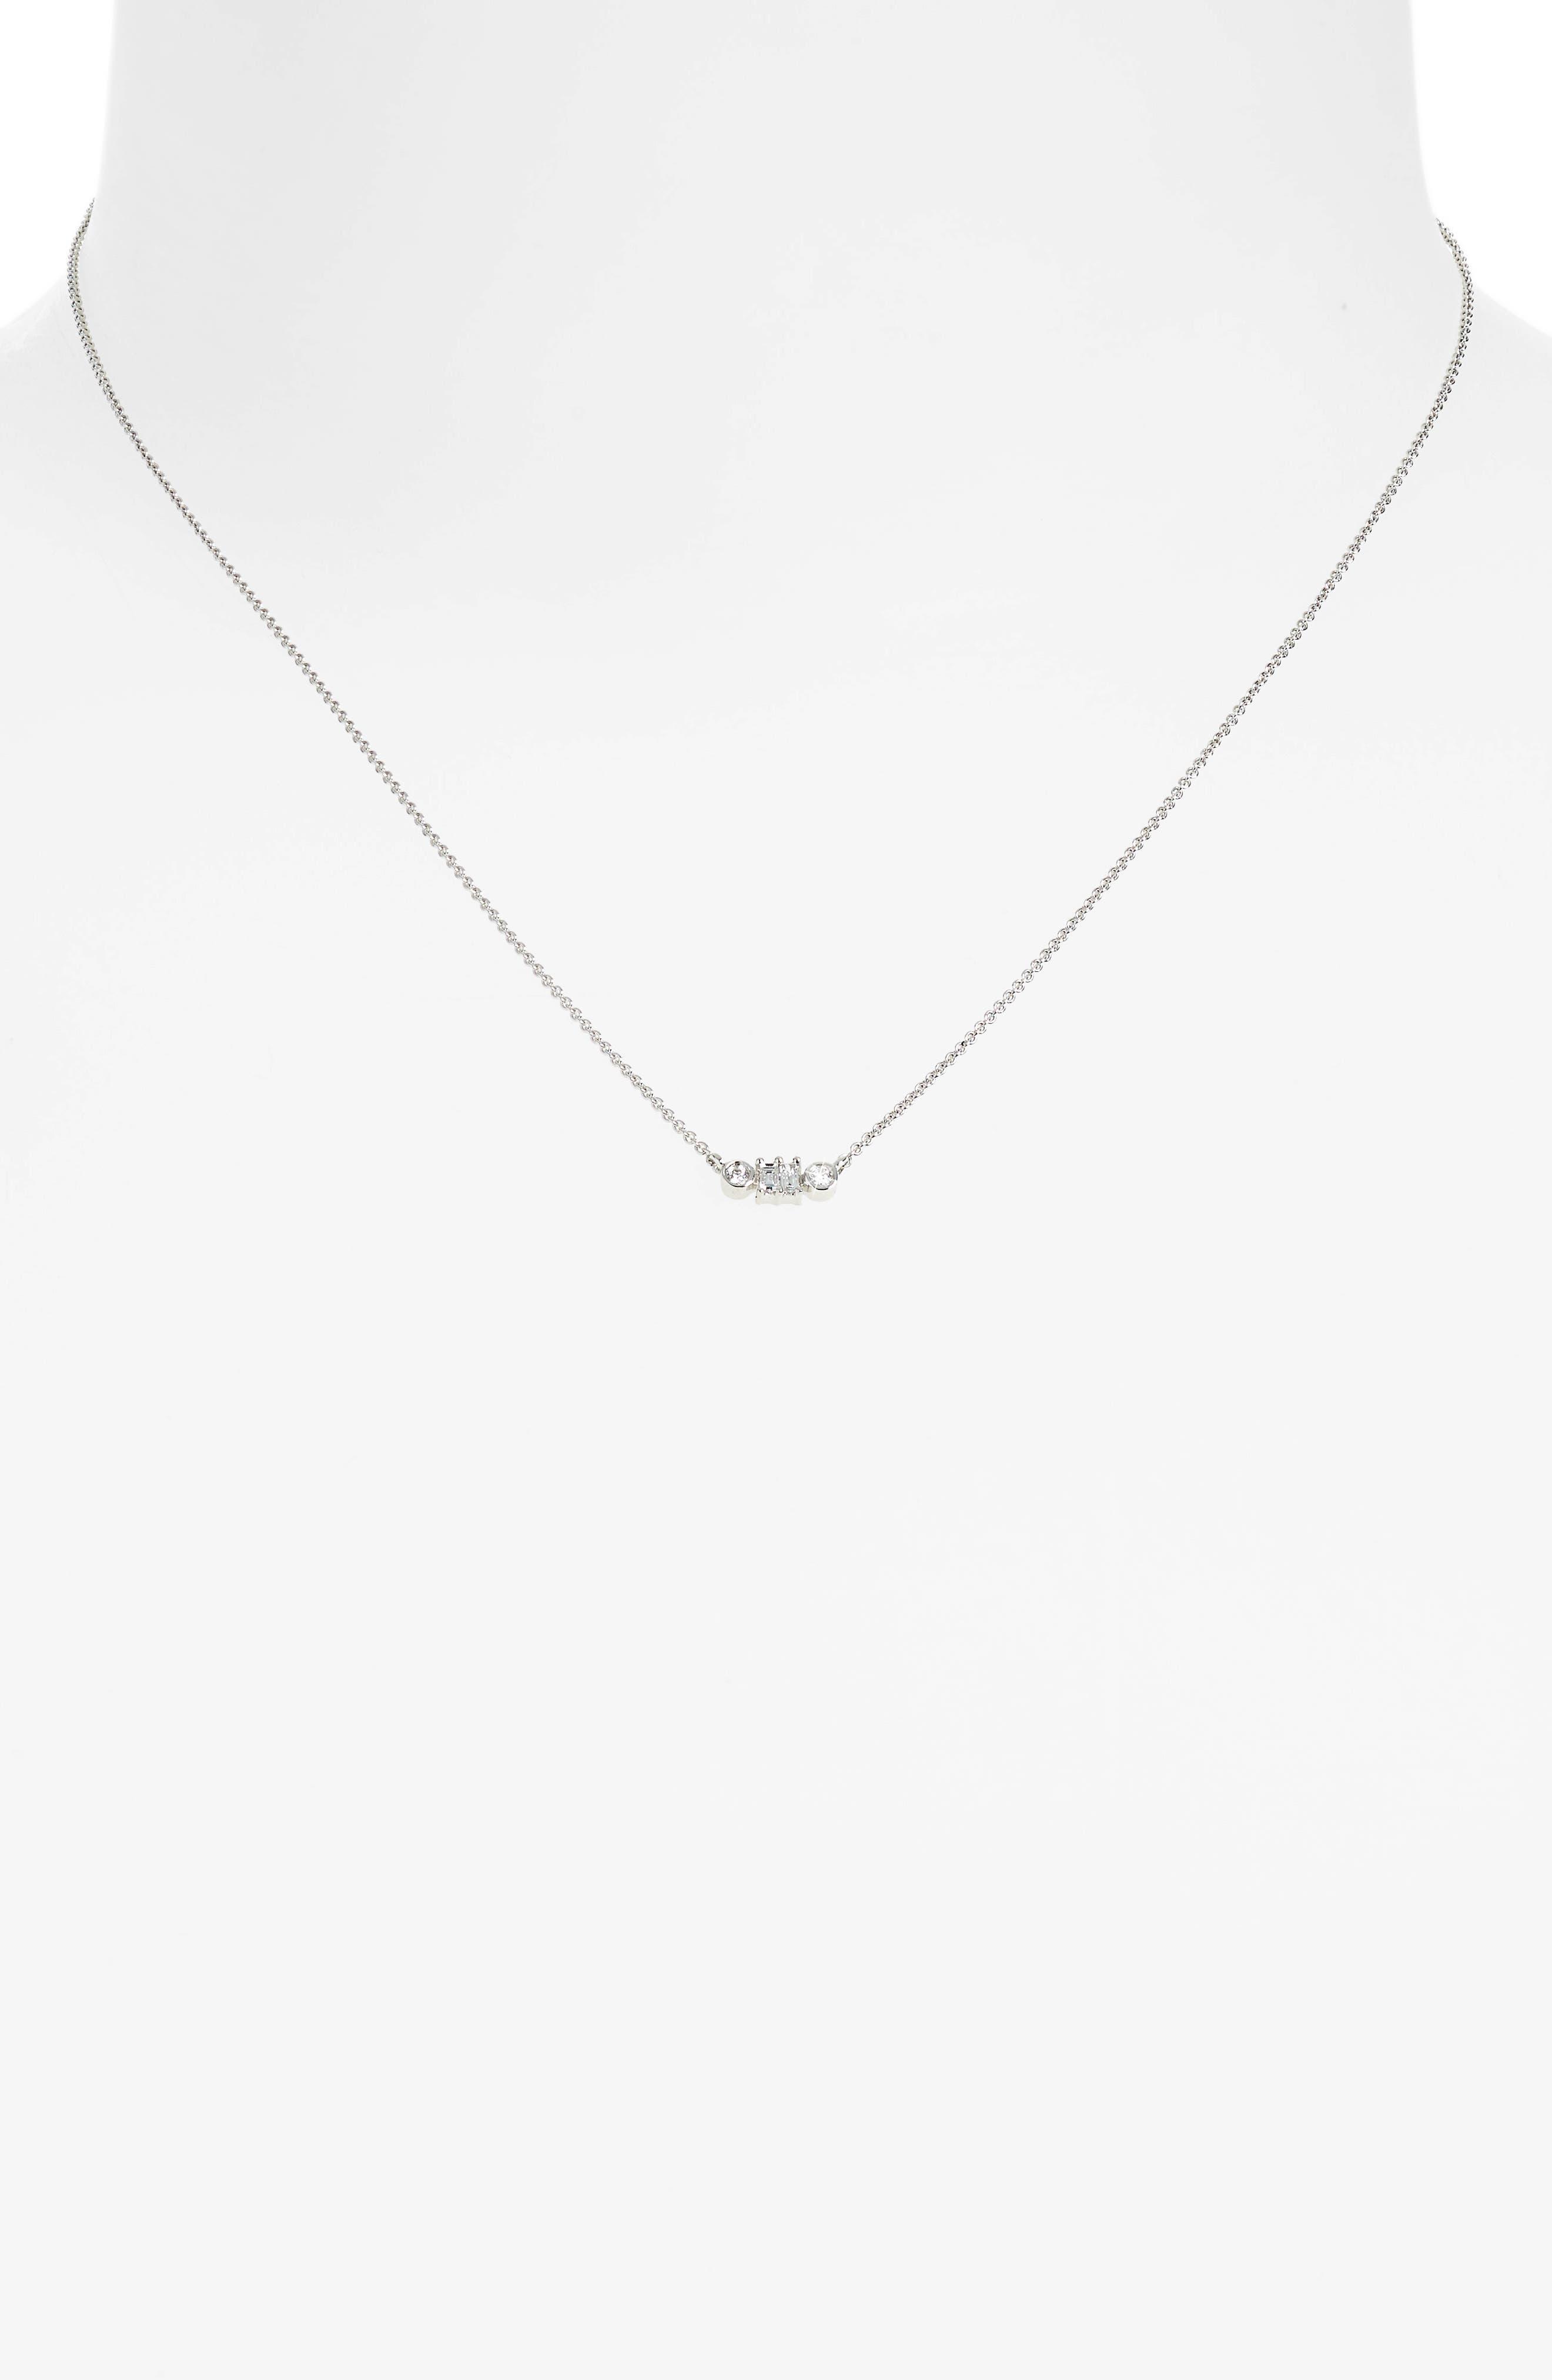 Dana Rebecca Sadie Diamond Baguette Pendant Necklace,                             Alternate thumbnail 2, color,                             WHITE GOLD